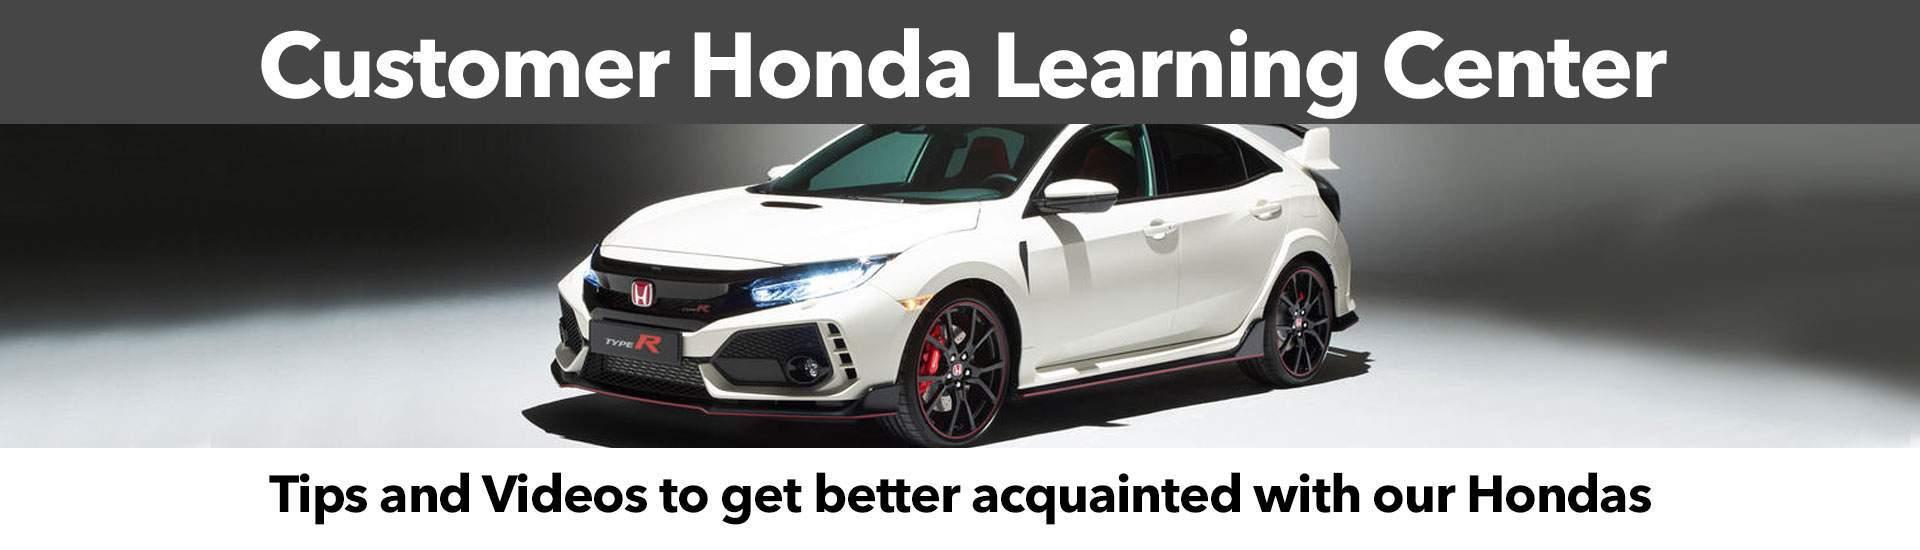 Honda Dealership Moncton Nb Used Cars Moncton Honda